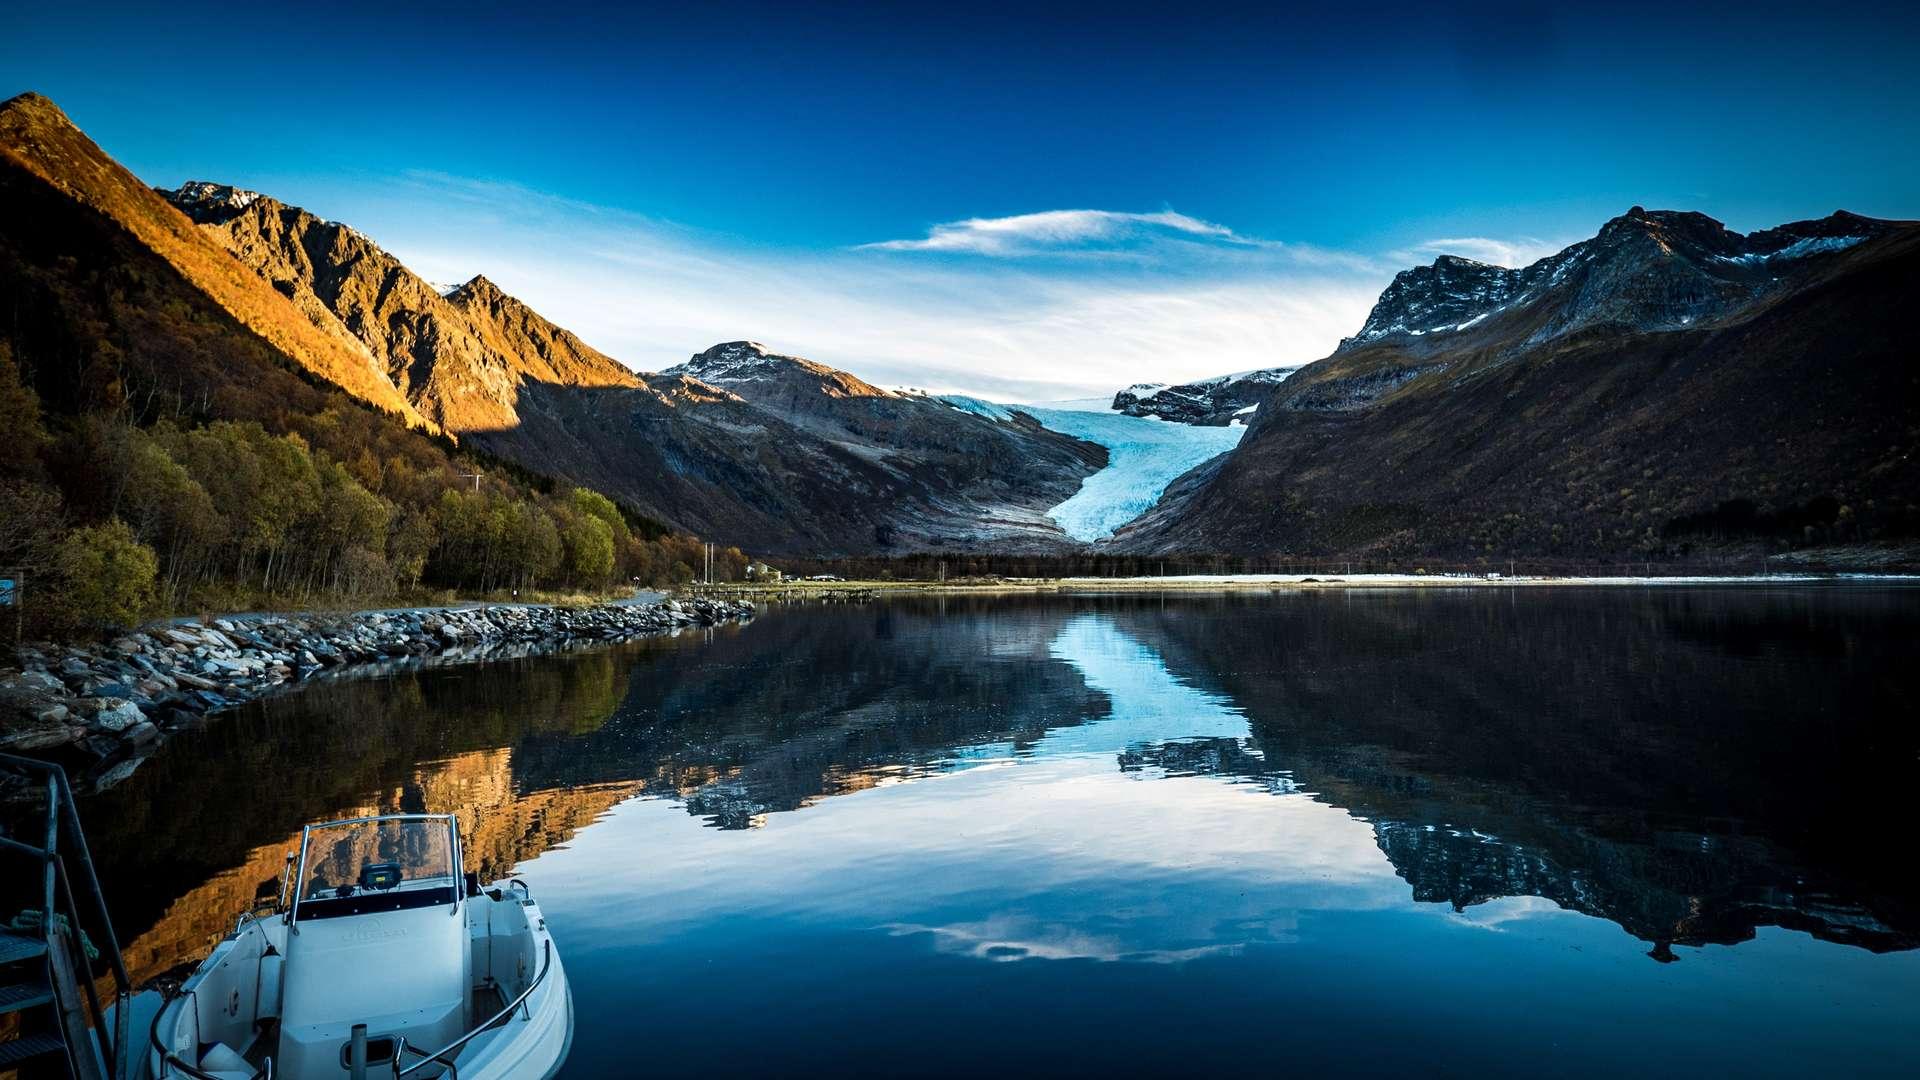 The glacier of Engenbreen descends from the massive glacier system of Svartisen © flightseeing.de